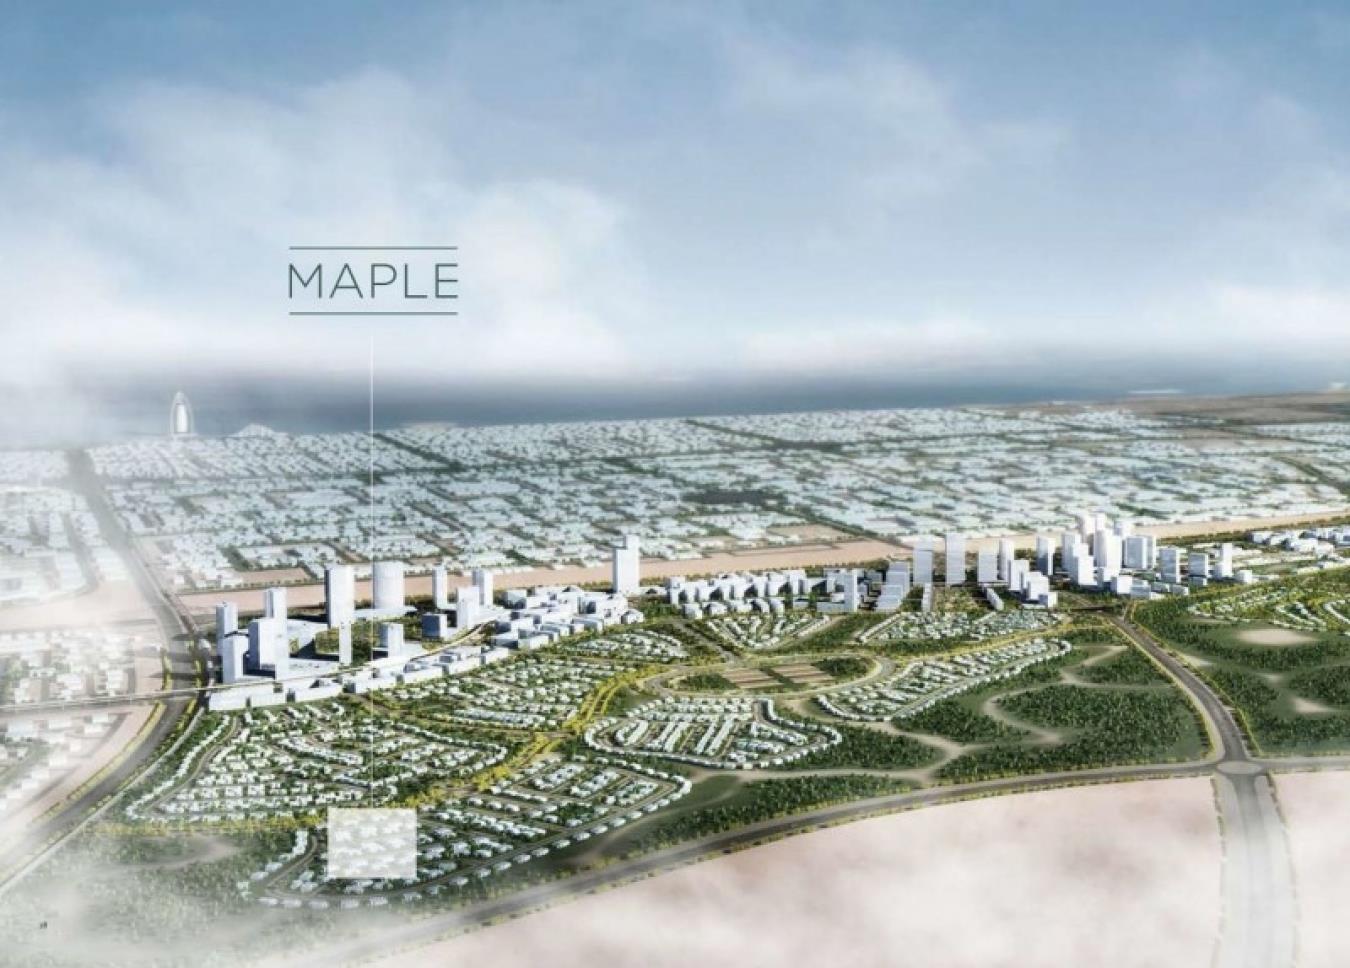 Maple 3 Great Price 4 Bedroom Large Plot